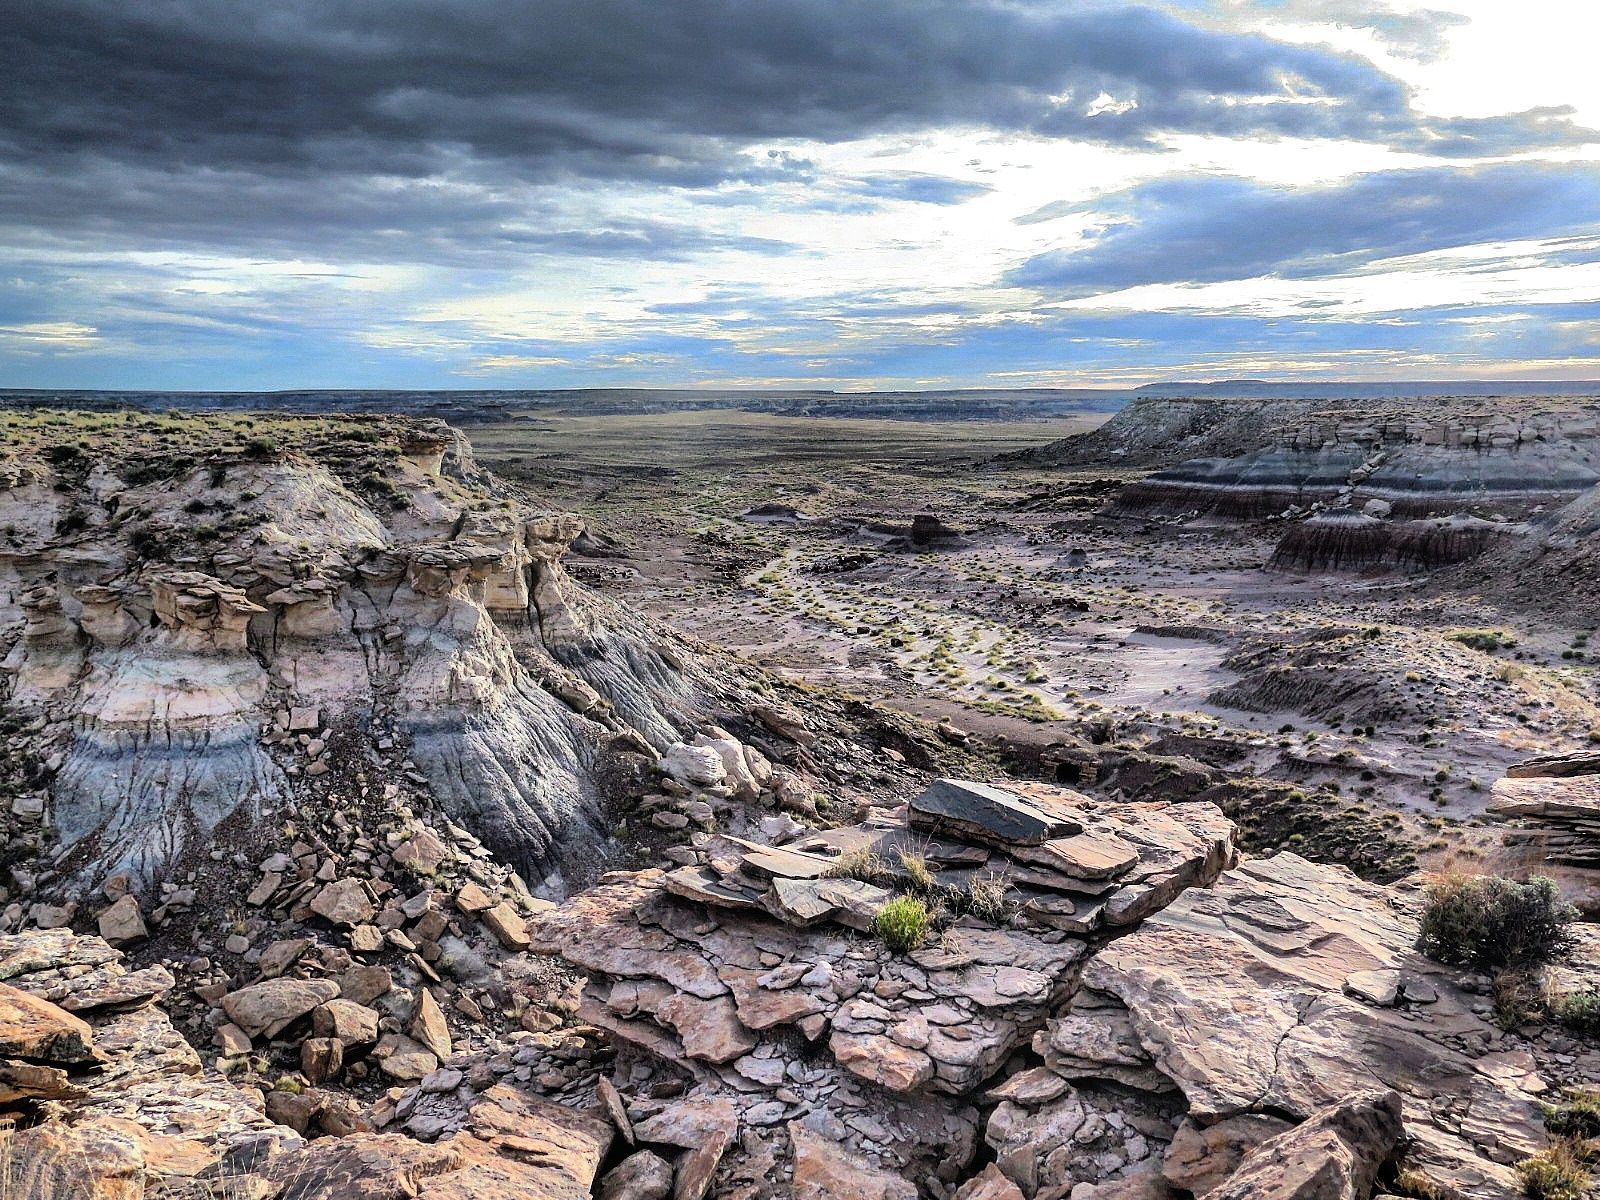 Petrified Forest National Park Arizona [OC][1600x1200]